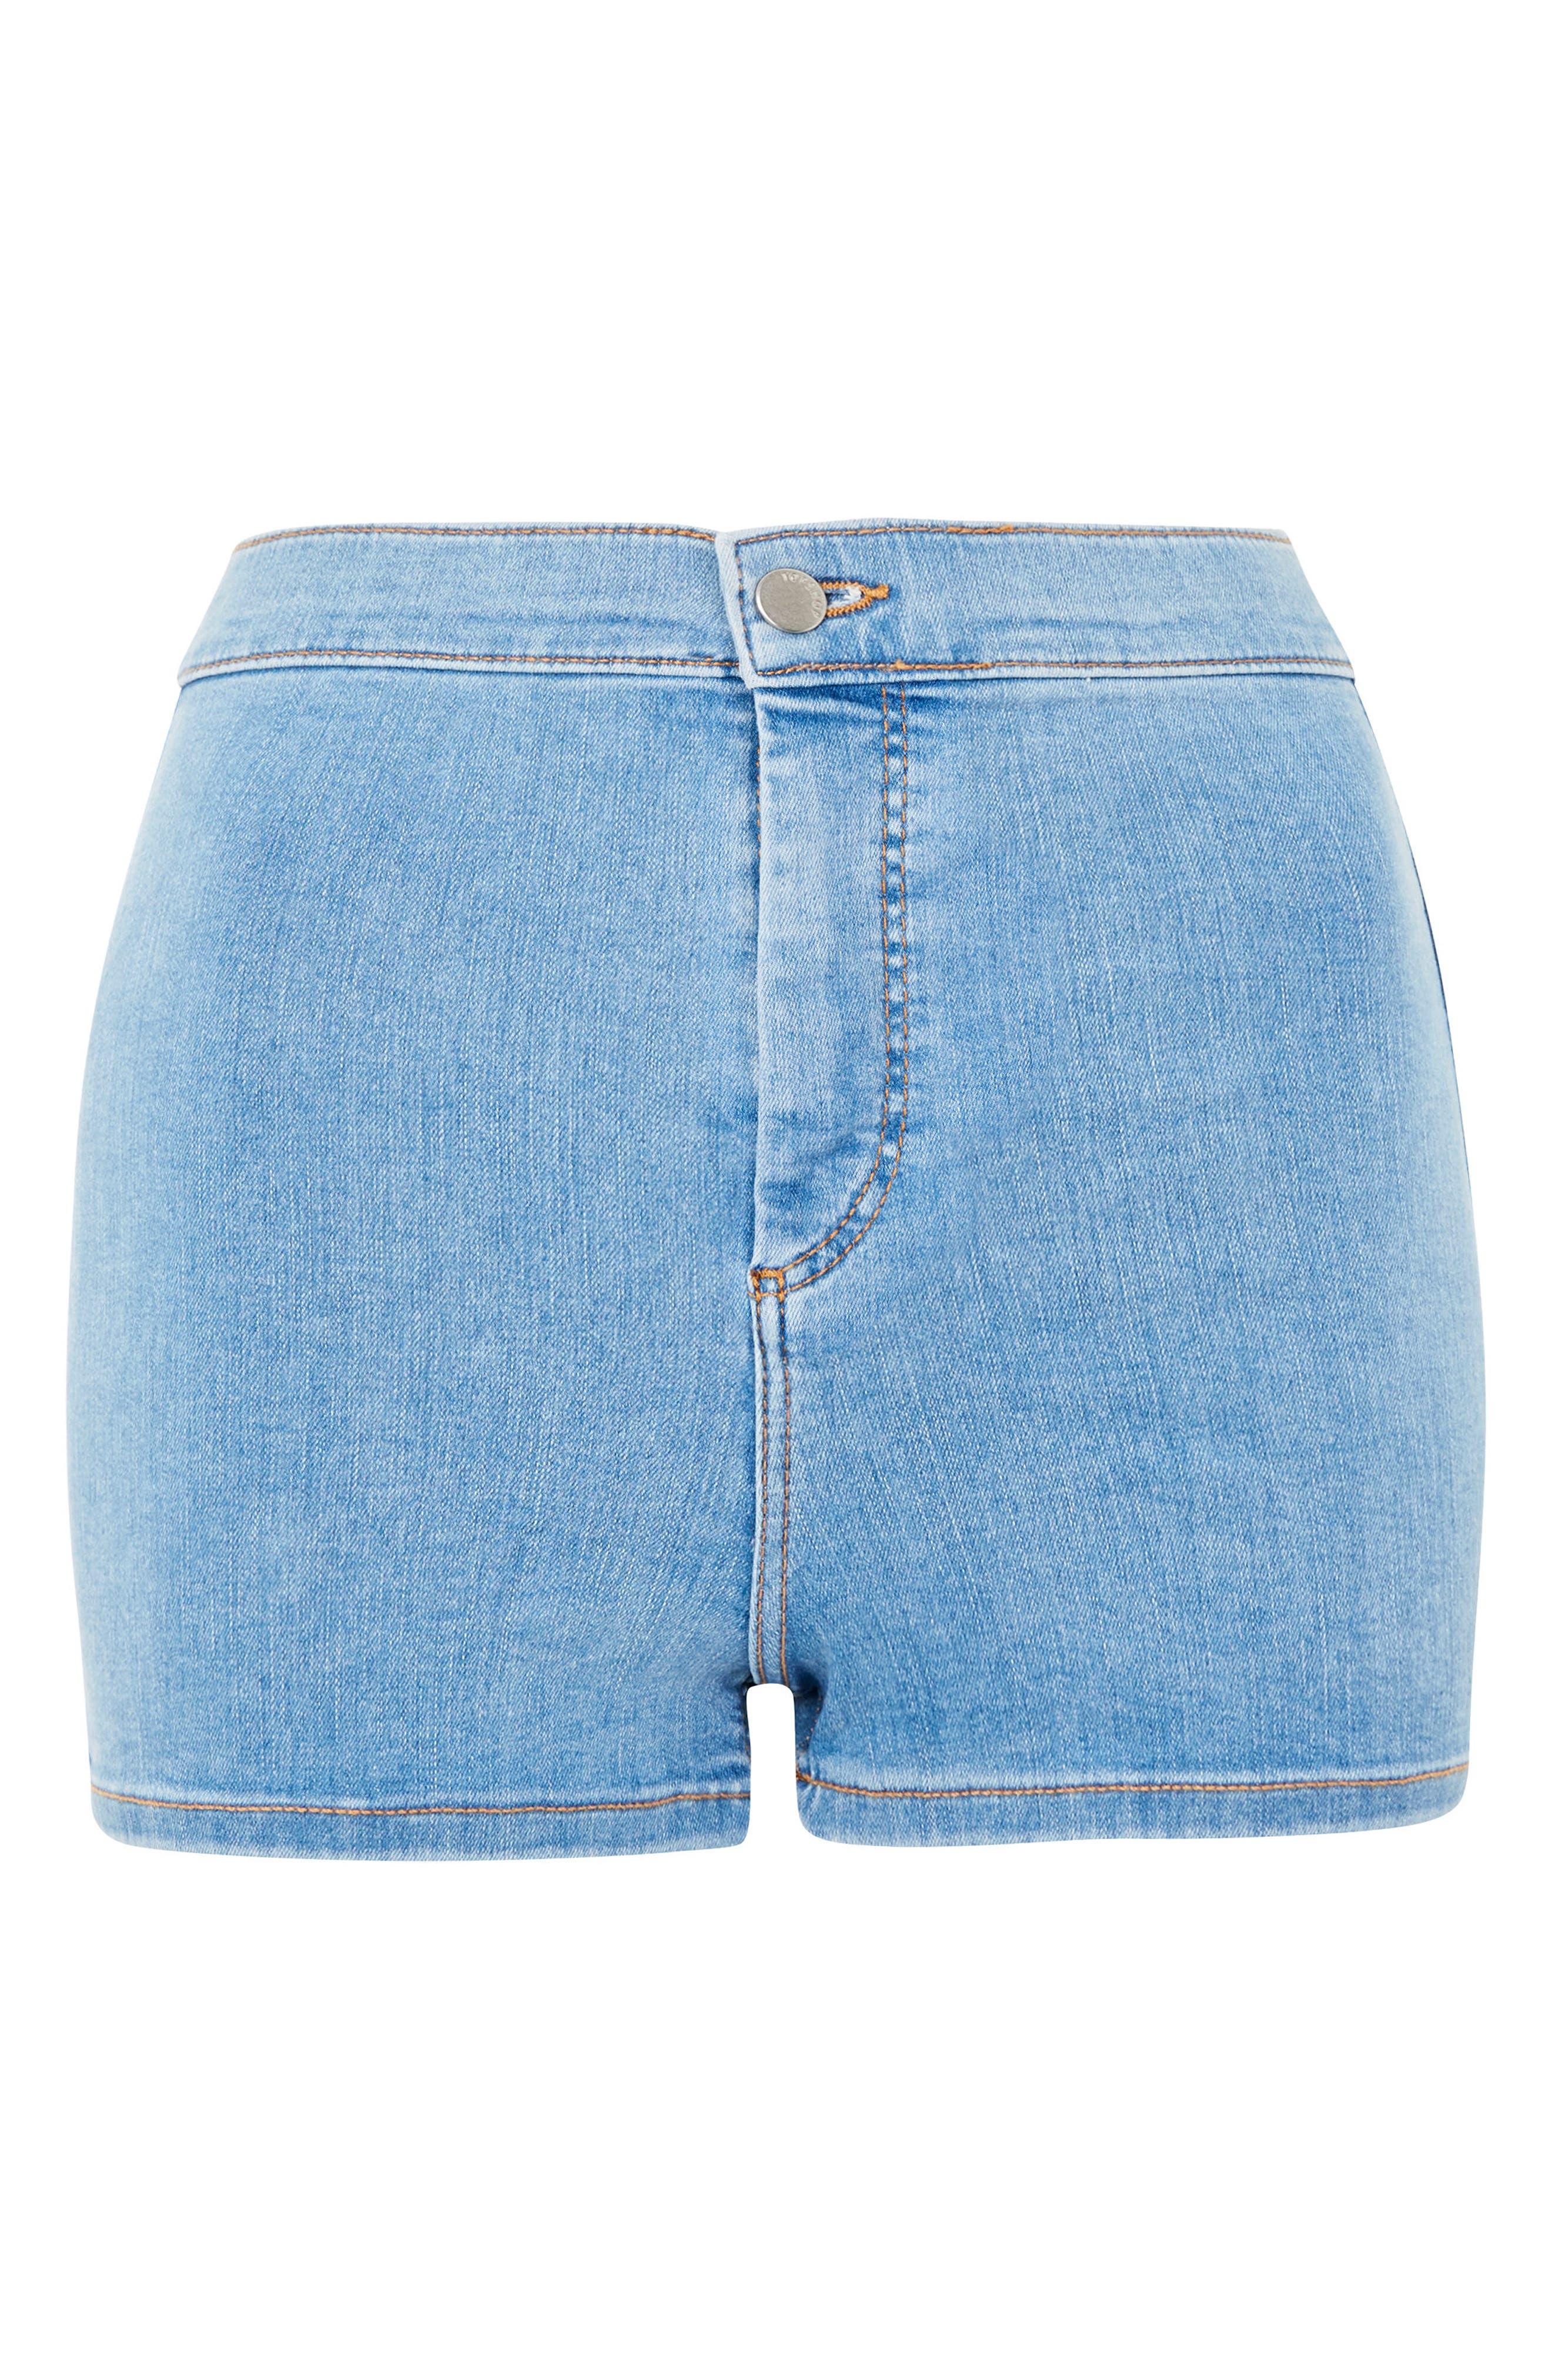 Joni Light Denim High Waist Shorts,                             Alternate thumbnail 3, color,                             450